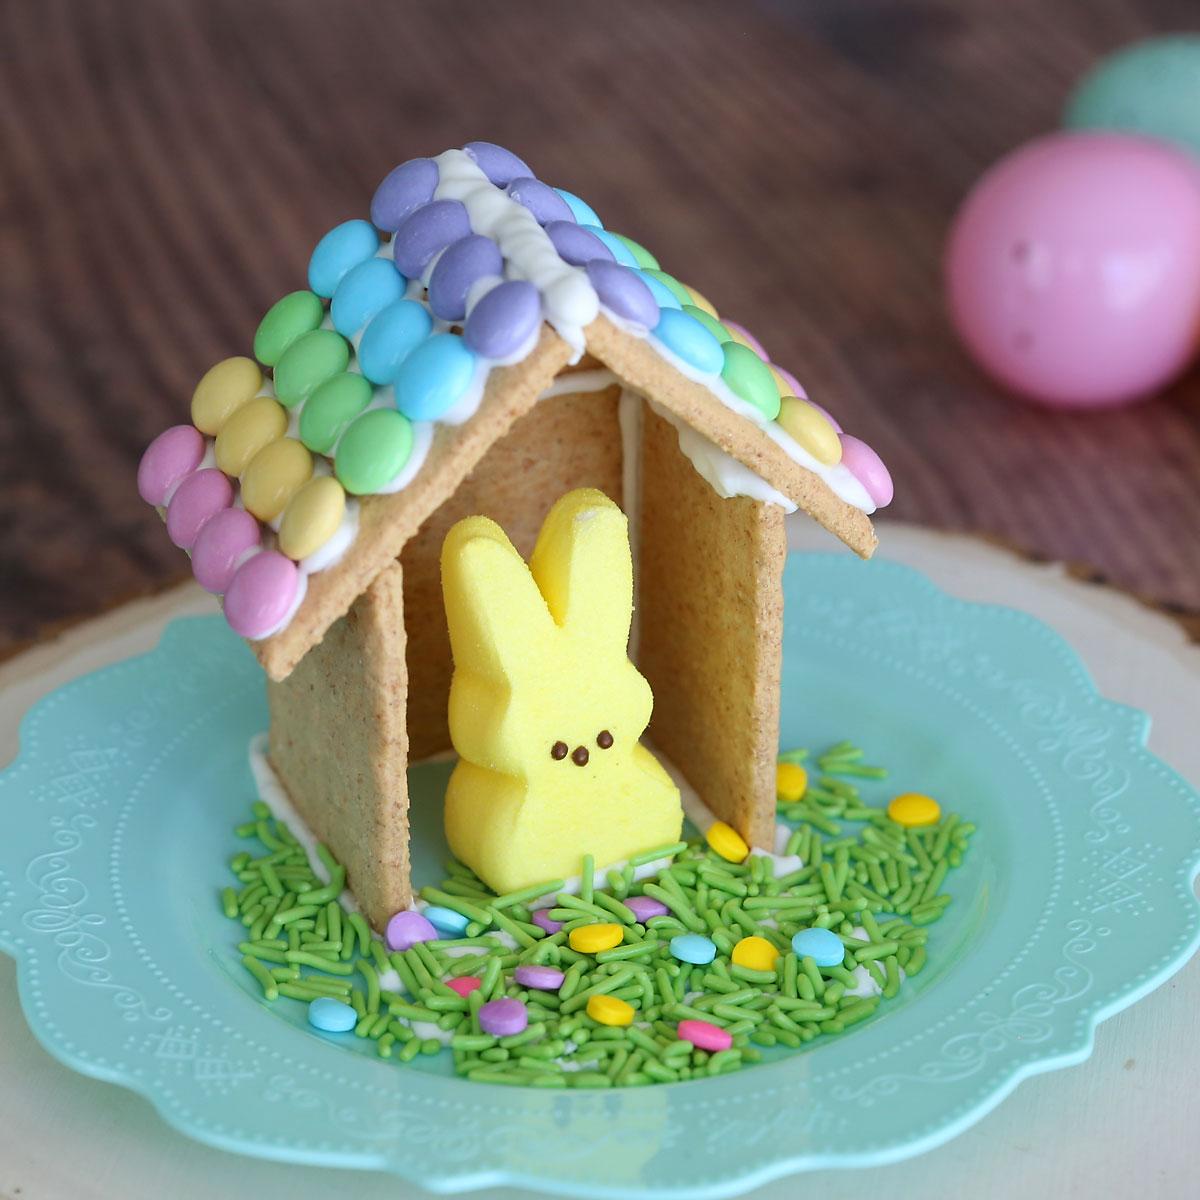 Make a nice Peeps house (Easter gingerbread house)